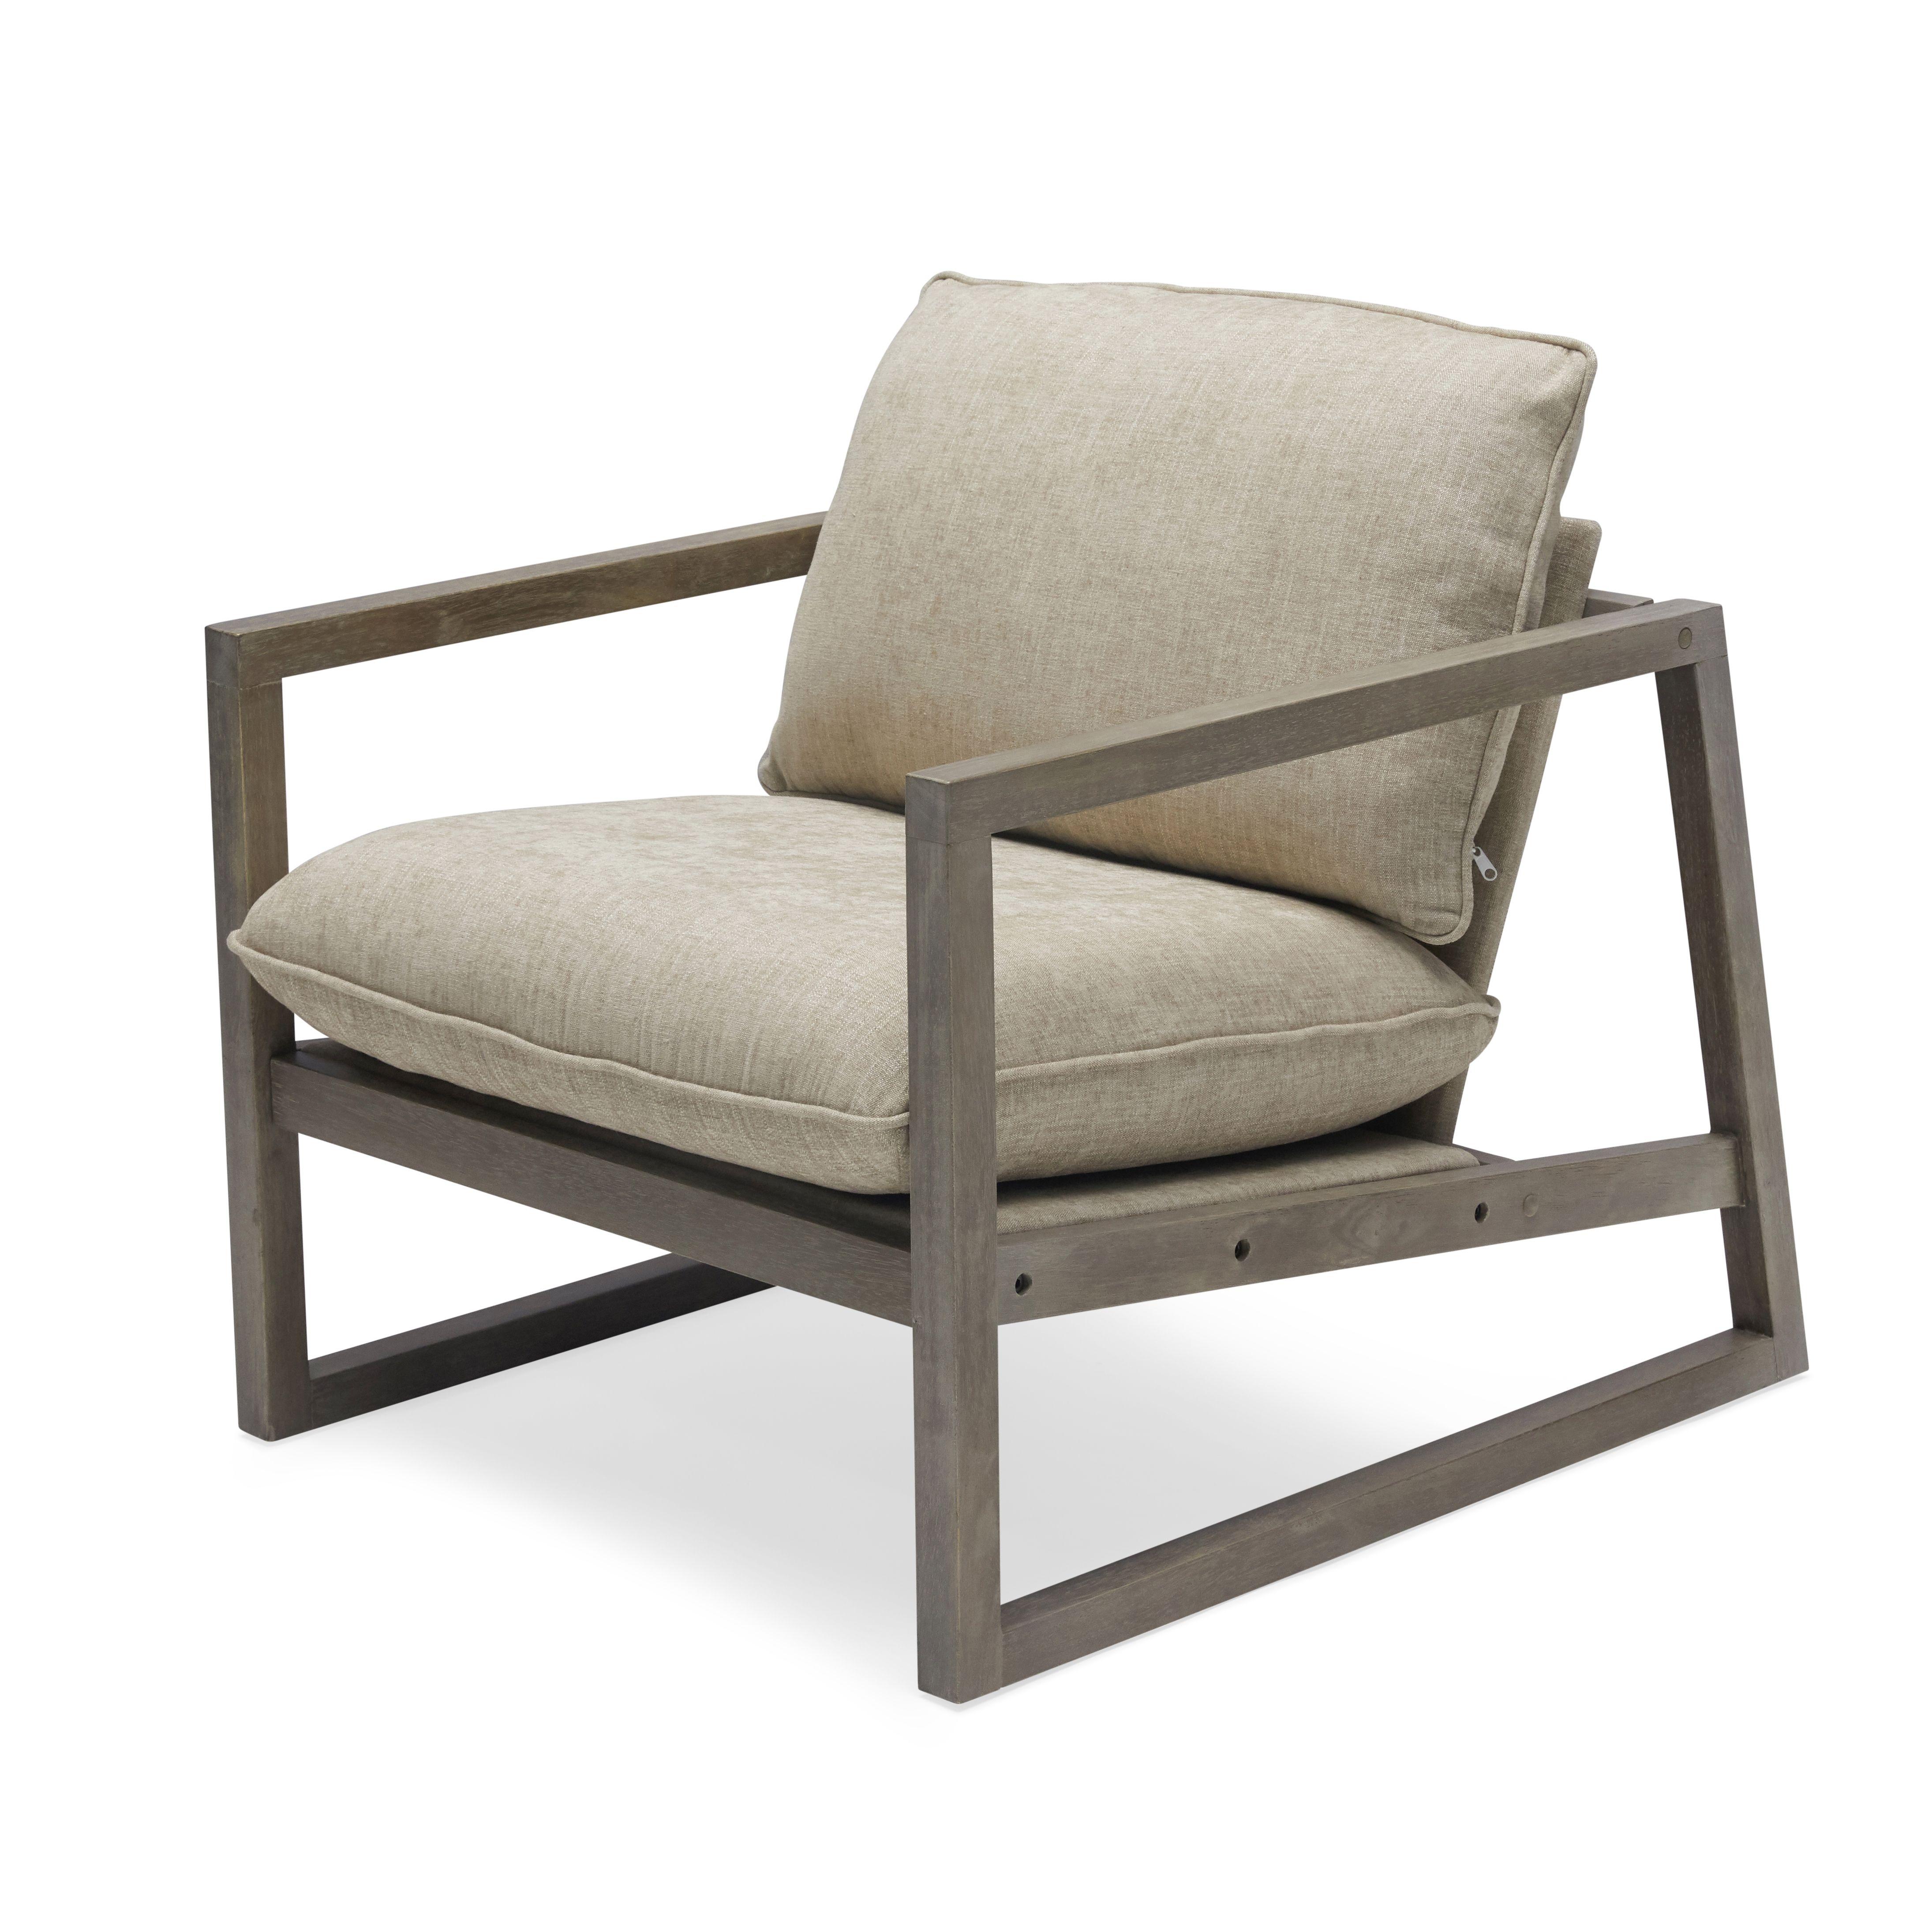 Modrn Naturals Oceanview Lounge Chair Multiple Colors Walmart Com Cozy Chair Chair Lounge Chair